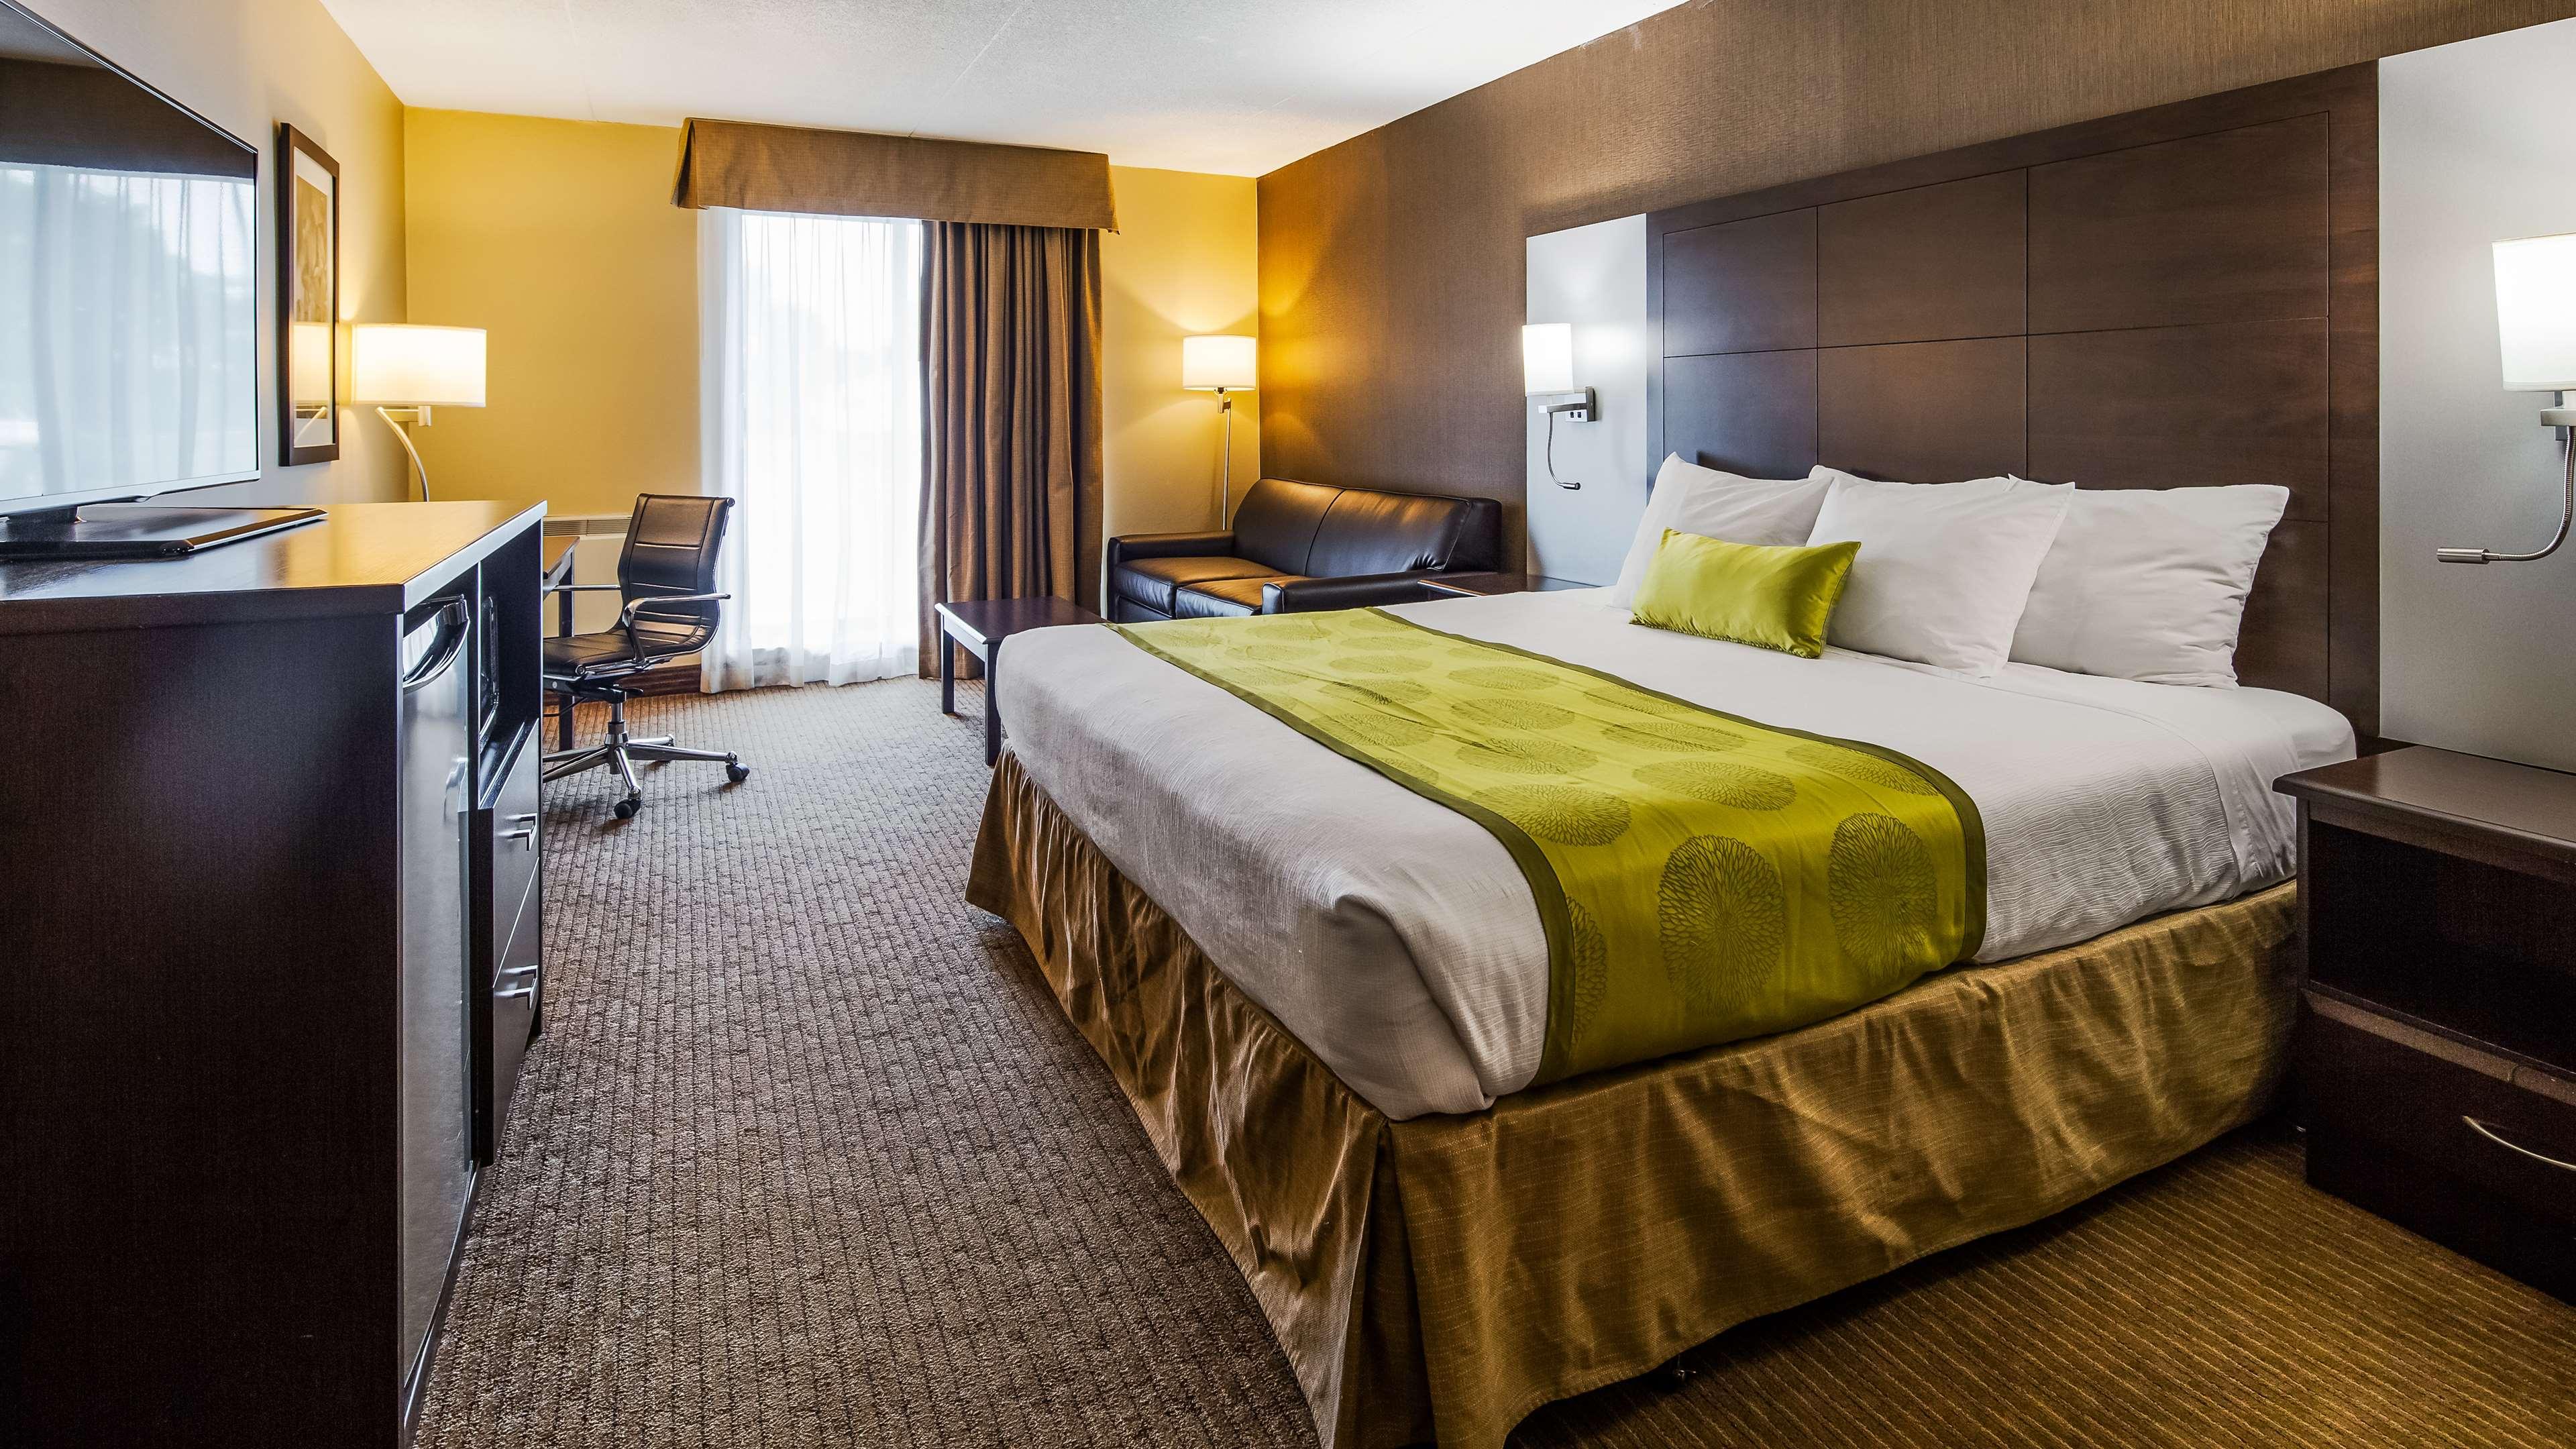 Guest Room Best Western Plus Leamington Hotel & Conference Centre Leamington (519)326-8646